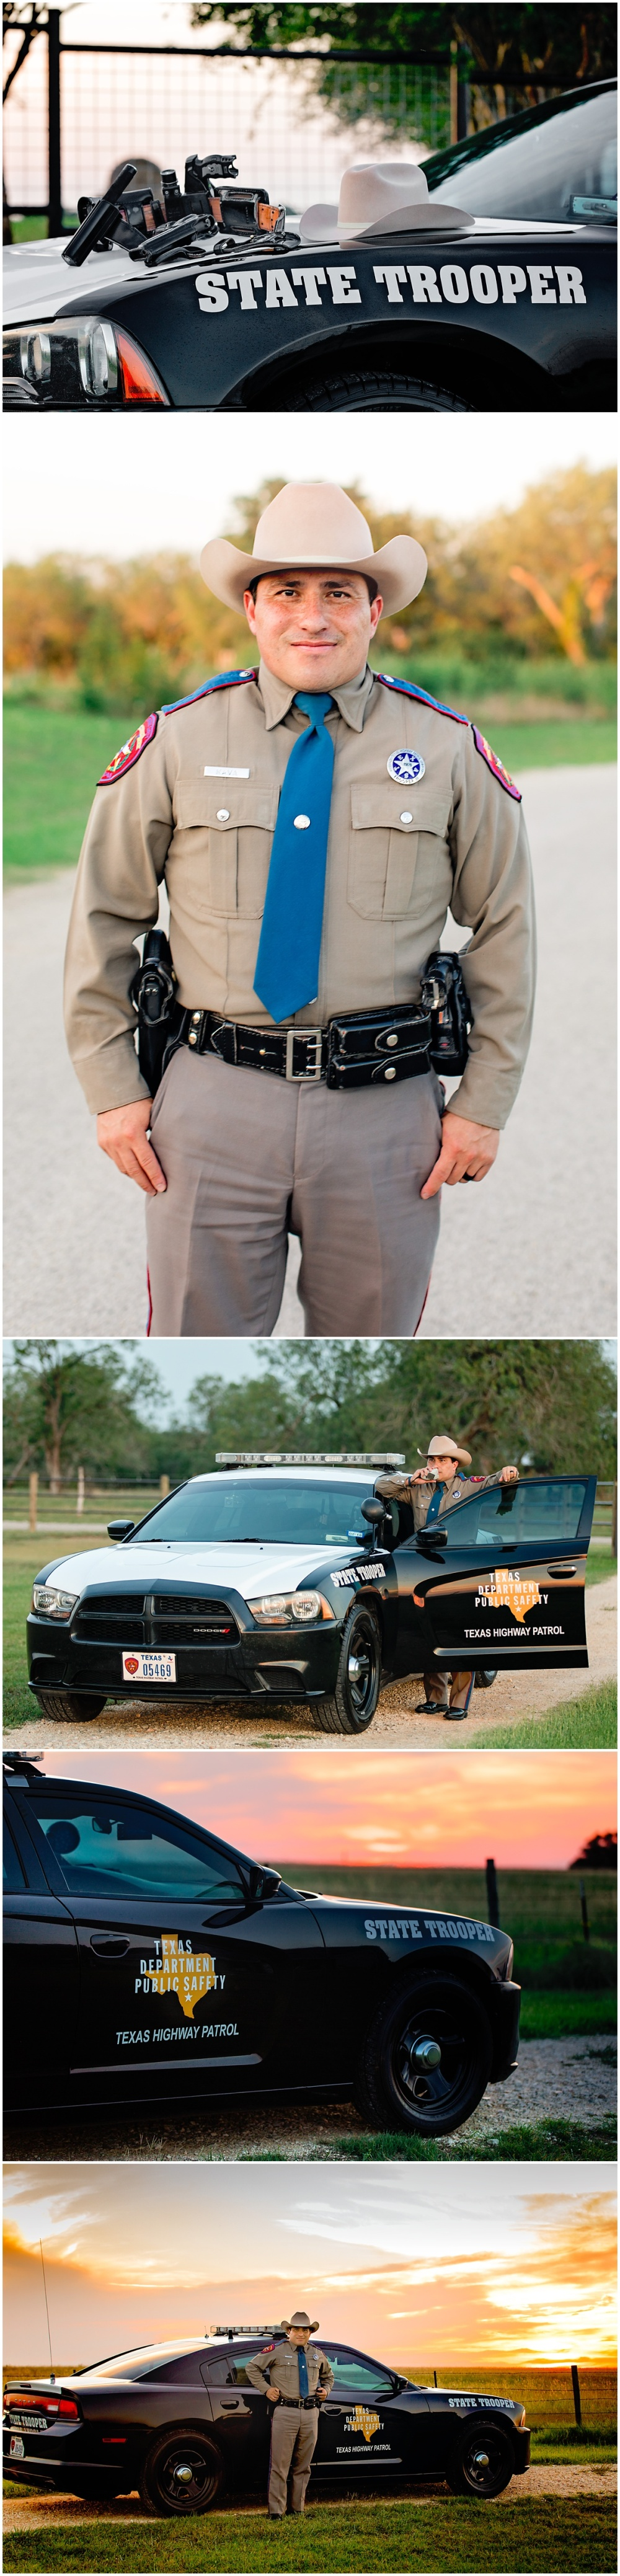 Portraits-State-Trooper-Photos-San-Antonio-Hill-Country-Texas-Carly-Barton-Photography_0009.jpg